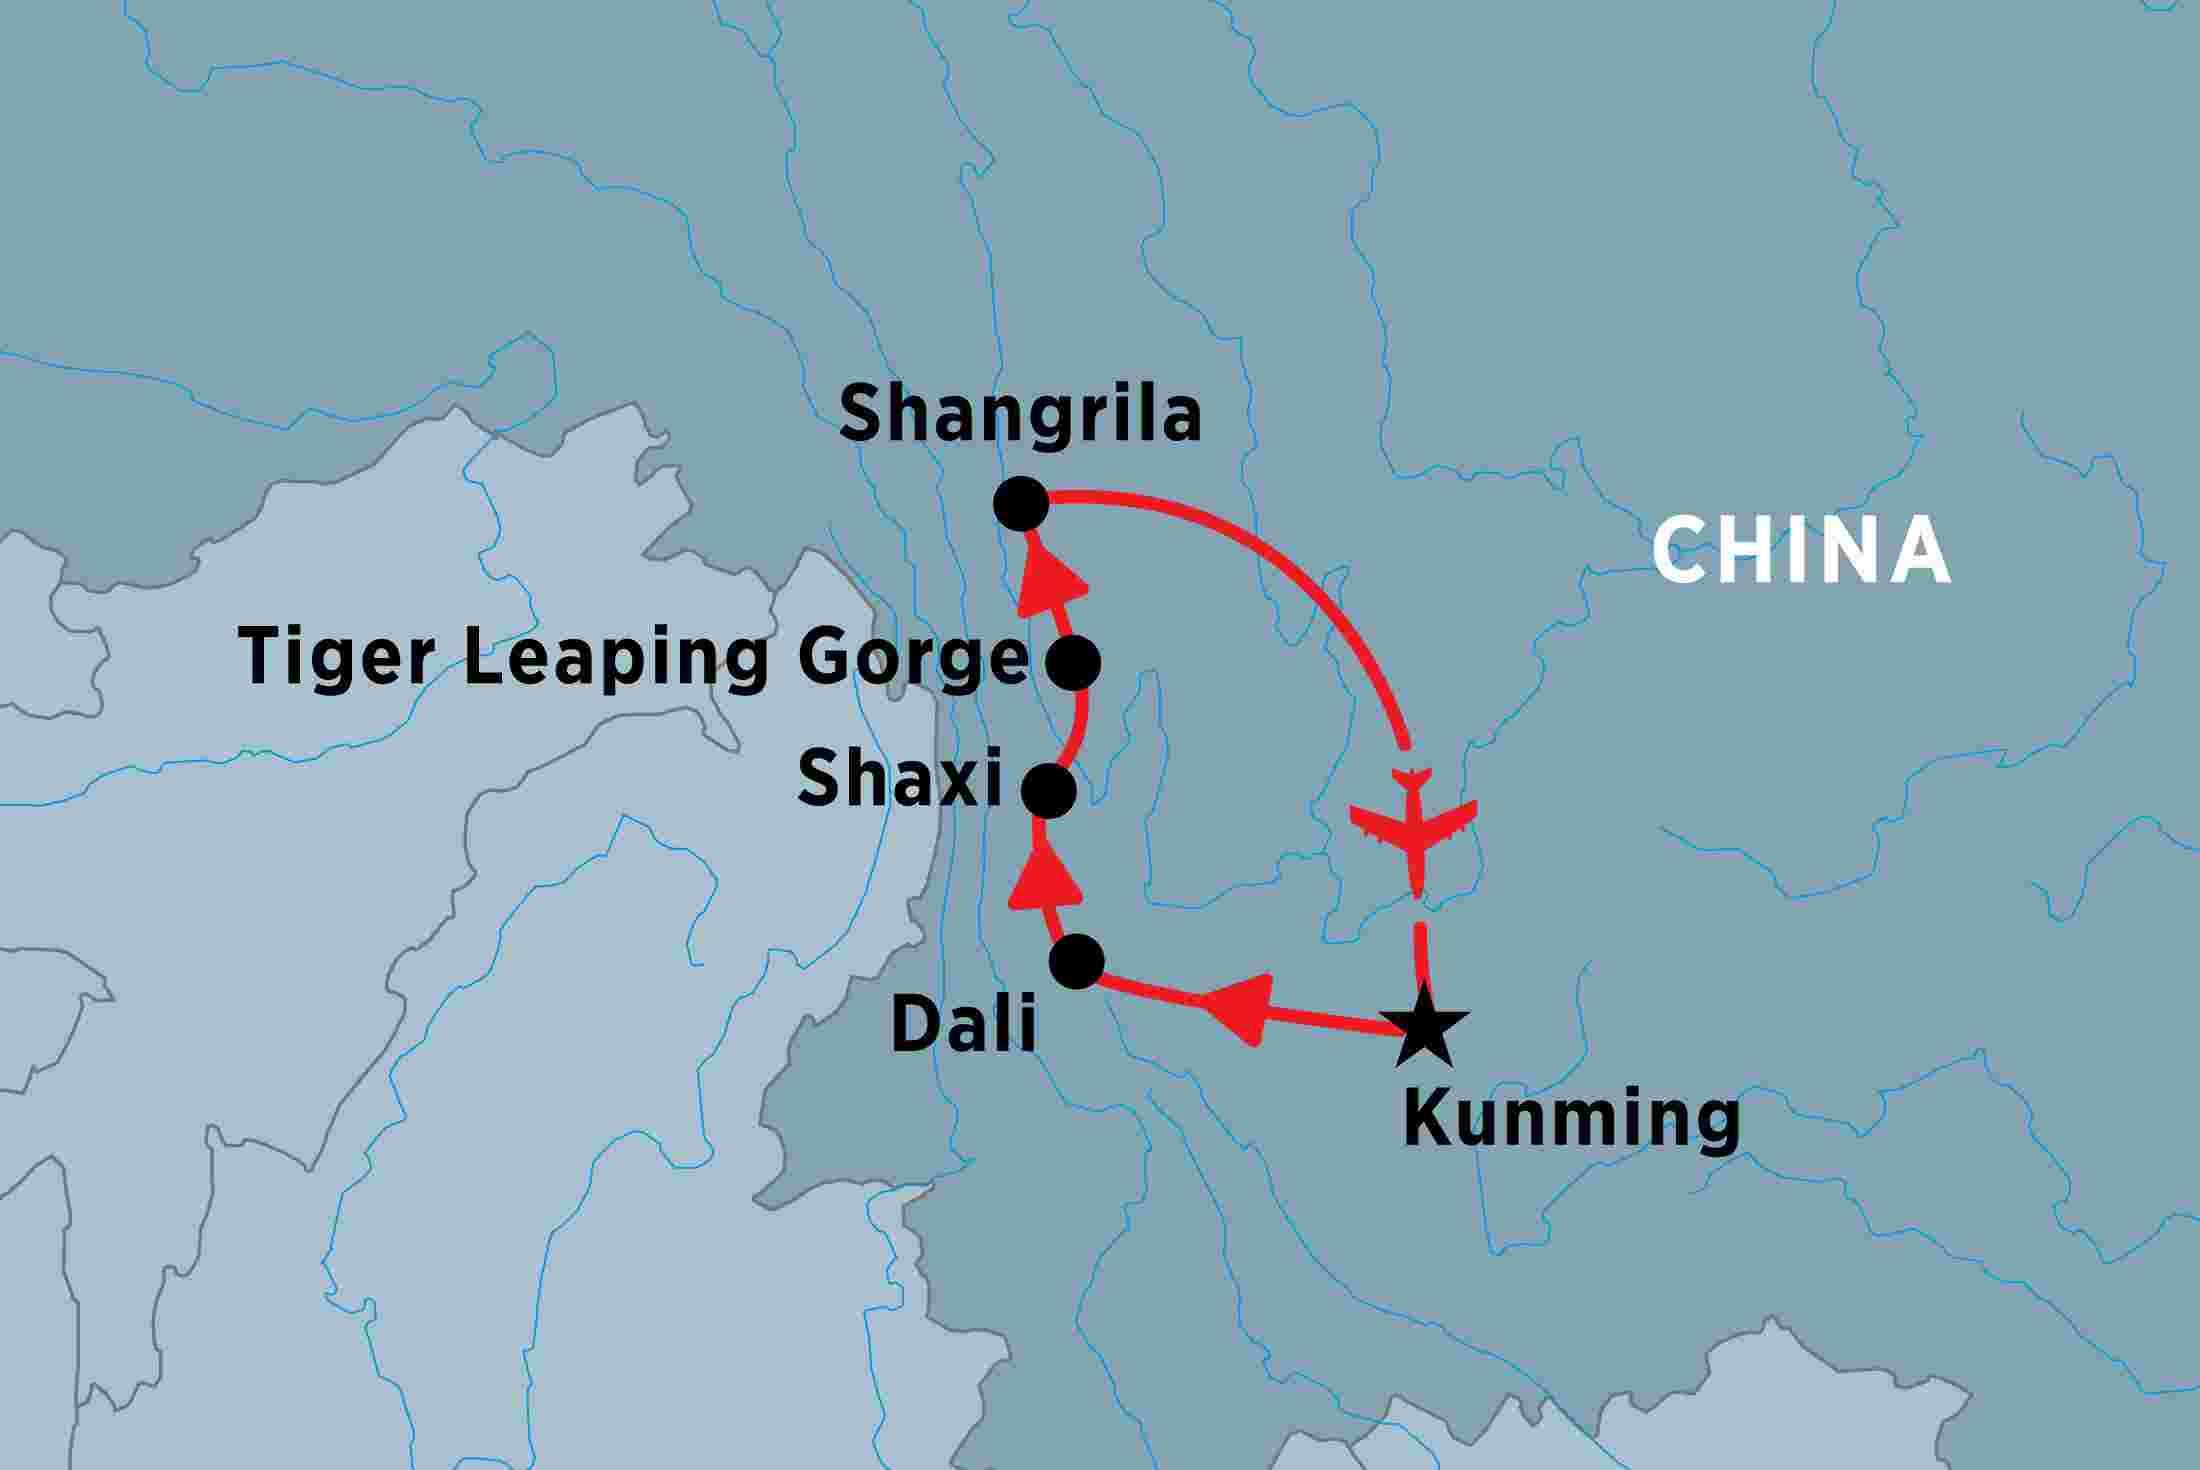 Wonders of Yunnan | Peregrine Adventures AU on vientiane world map, auckland world map, dunhuang world map, gansu world map, chengdu world map, ho chi minh city world map, kashgar world map, urumqi world map, changsha world map, wuxi world map, kaifeng world map, shenyang world map, surabaya world map, shangri-la world map, suzhou world map, jeddah world map, guizhou world map, luoyang world map, fukuoka world map, yangzhou world map,